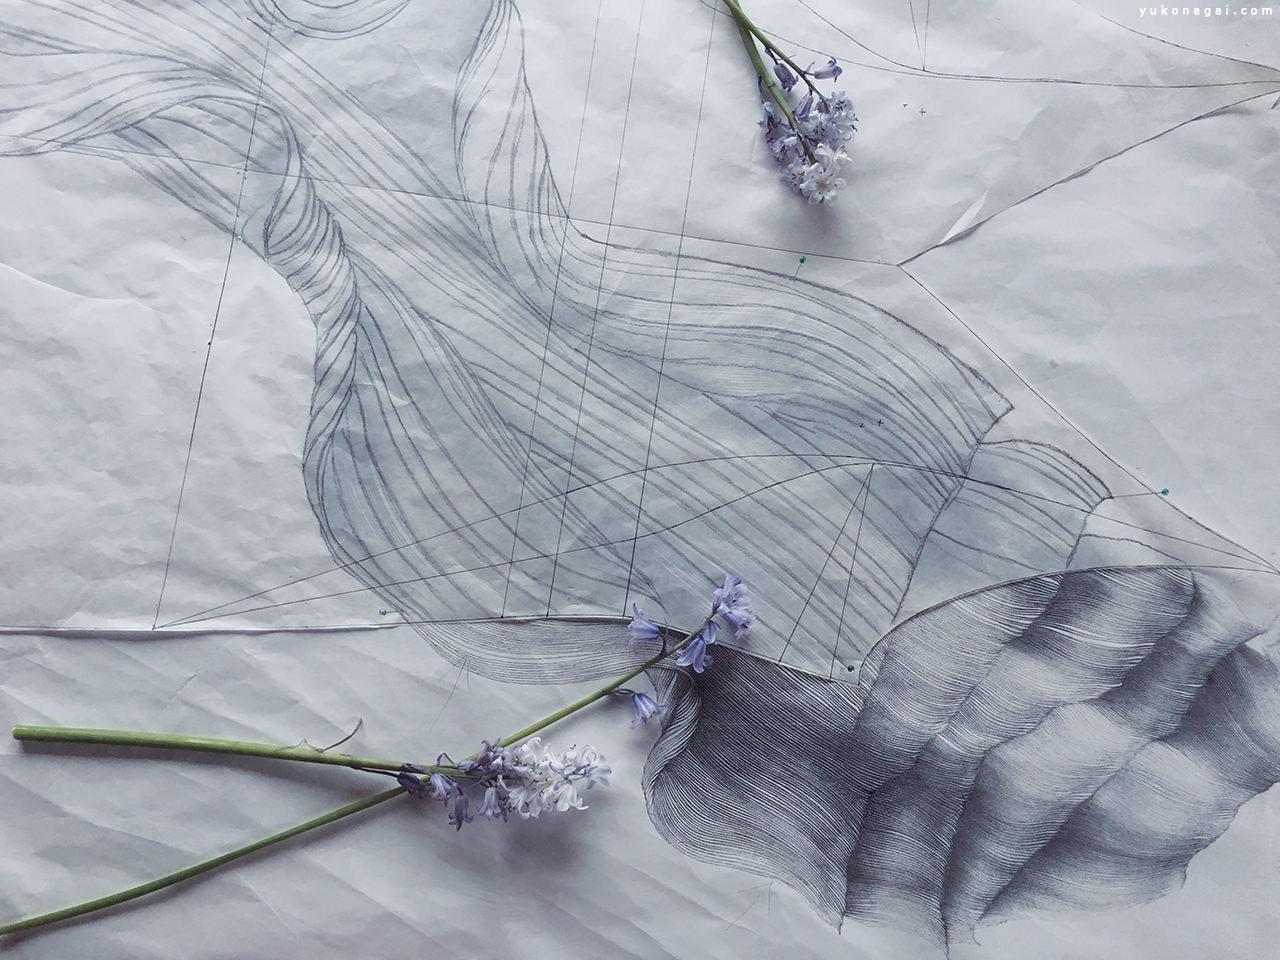 Abstract pencil drawing of a petal, and hyacinths.